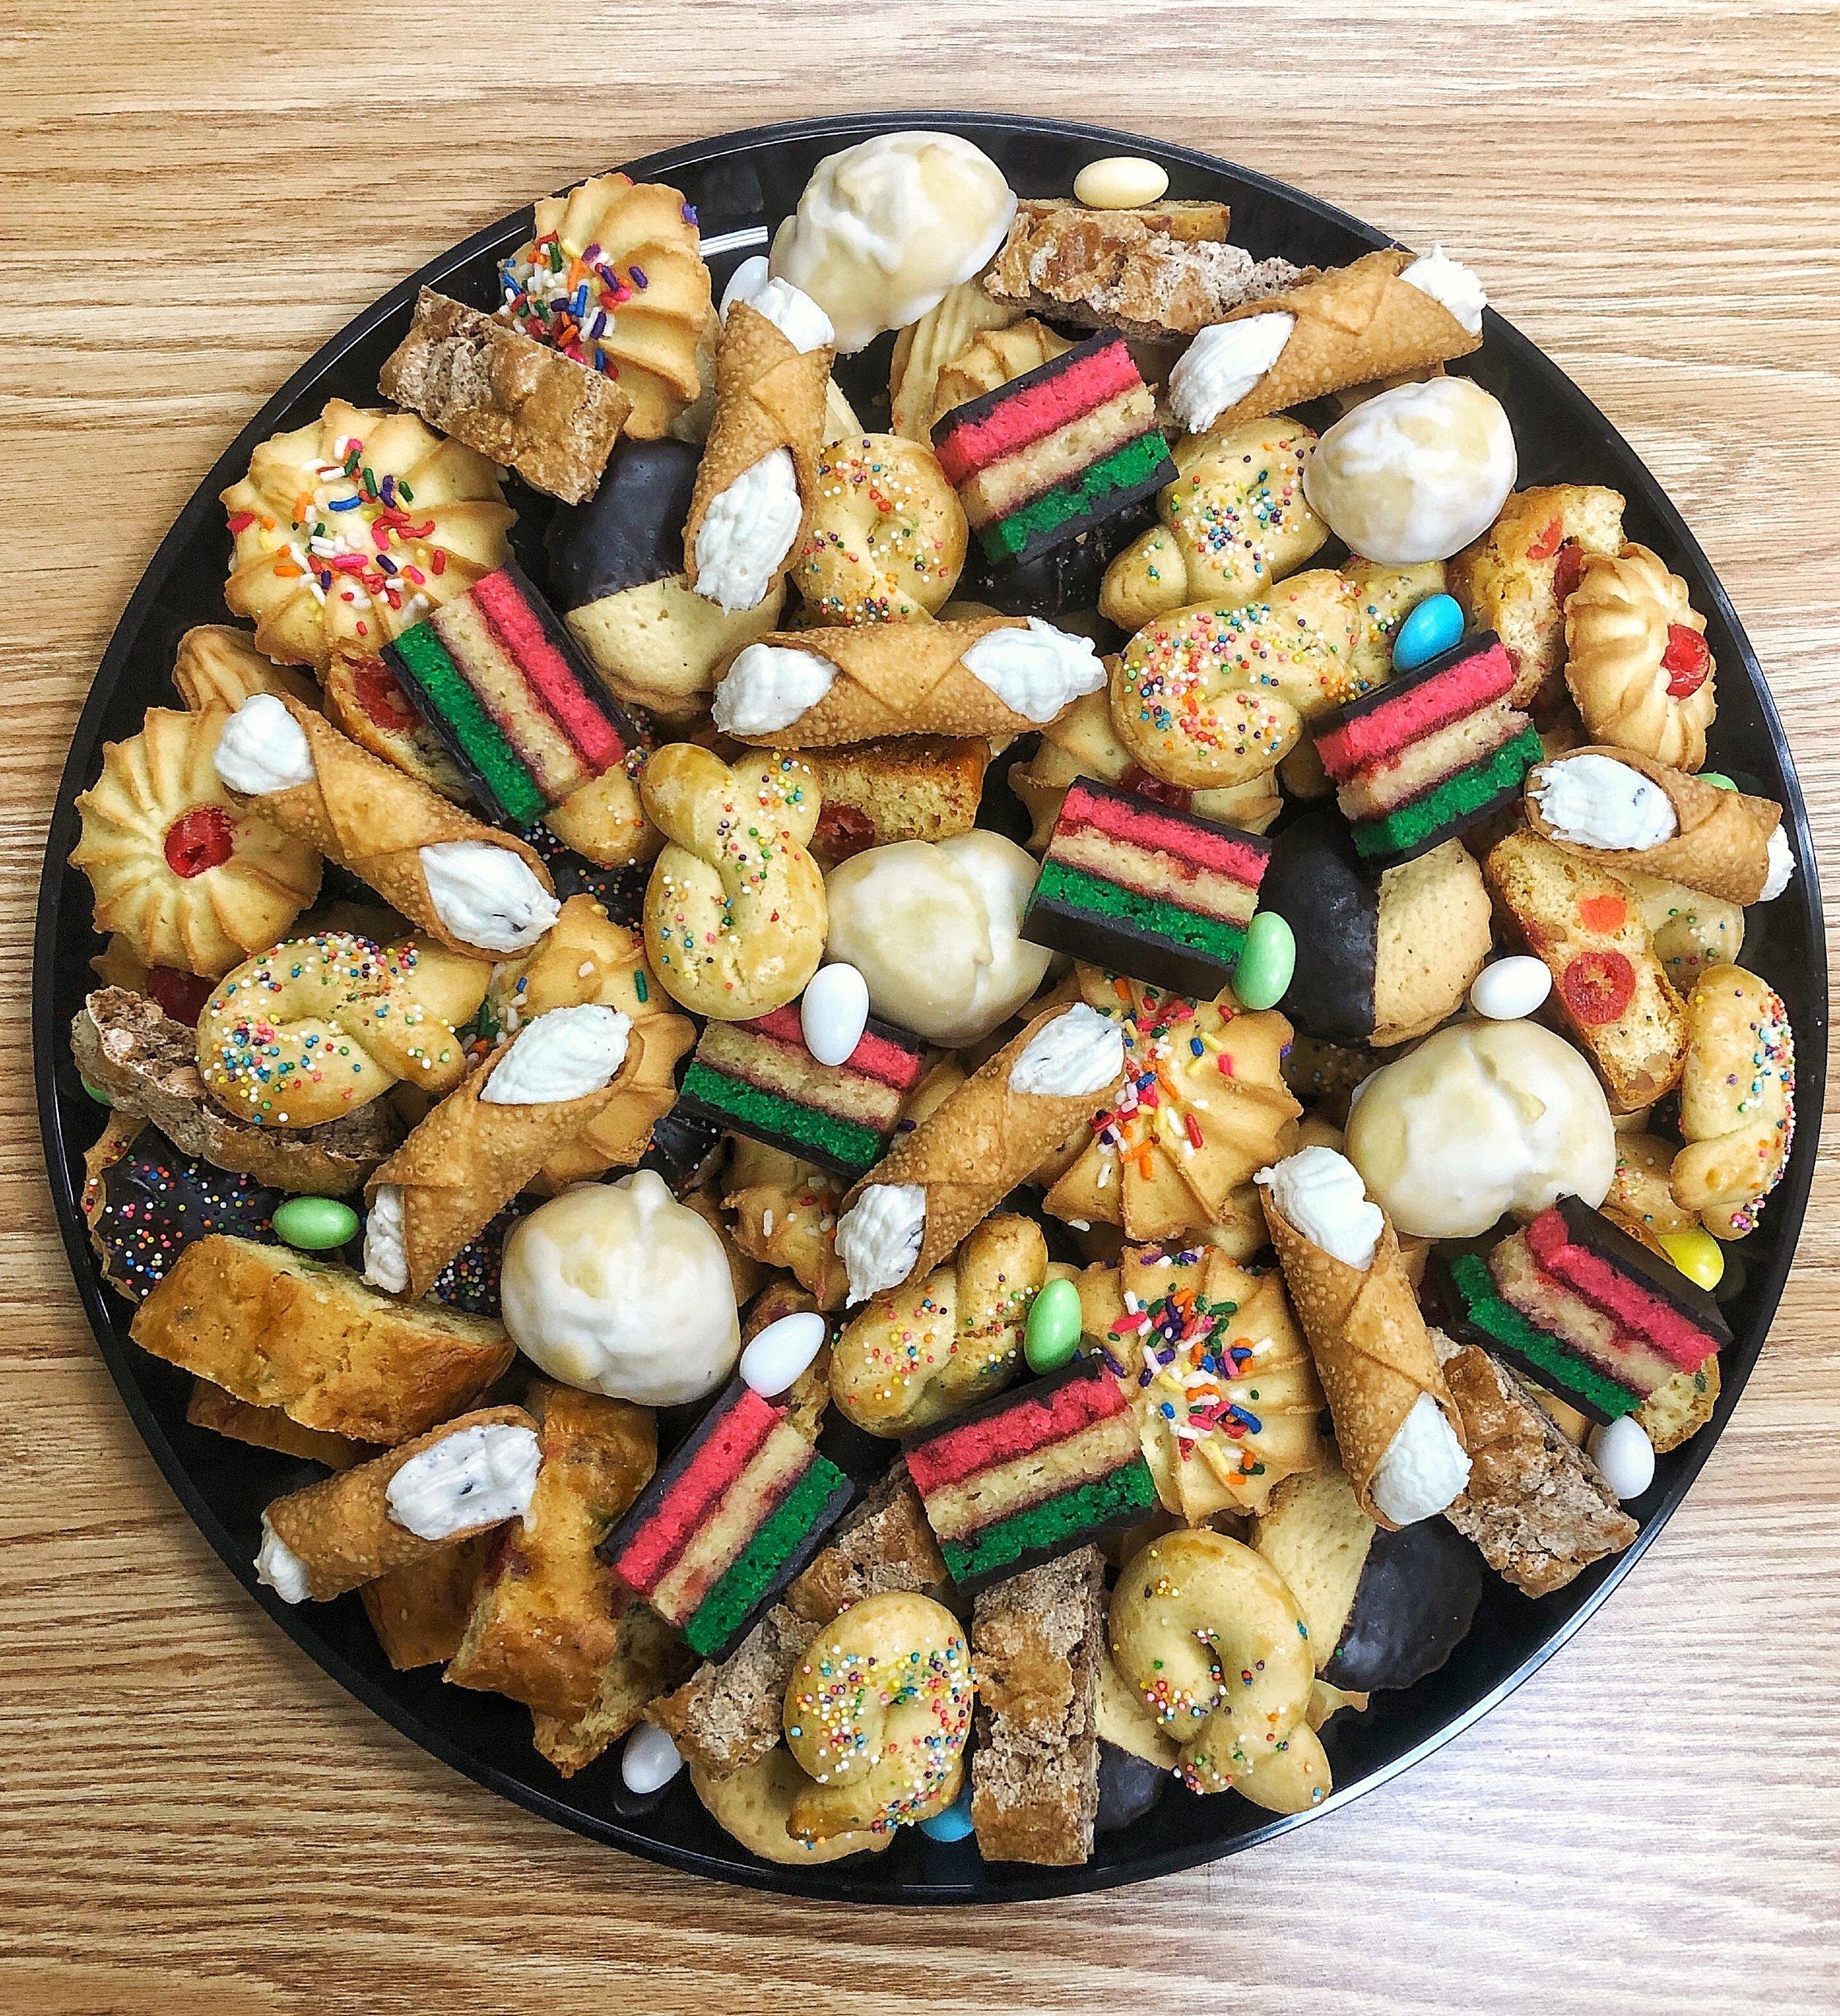 price ranges - - Cookies from New York City- Cannolis- Tiramisu- Carrot Cake- Red Velvet Cake- Black Forest Cake- Cheese Cake➜ Learn More